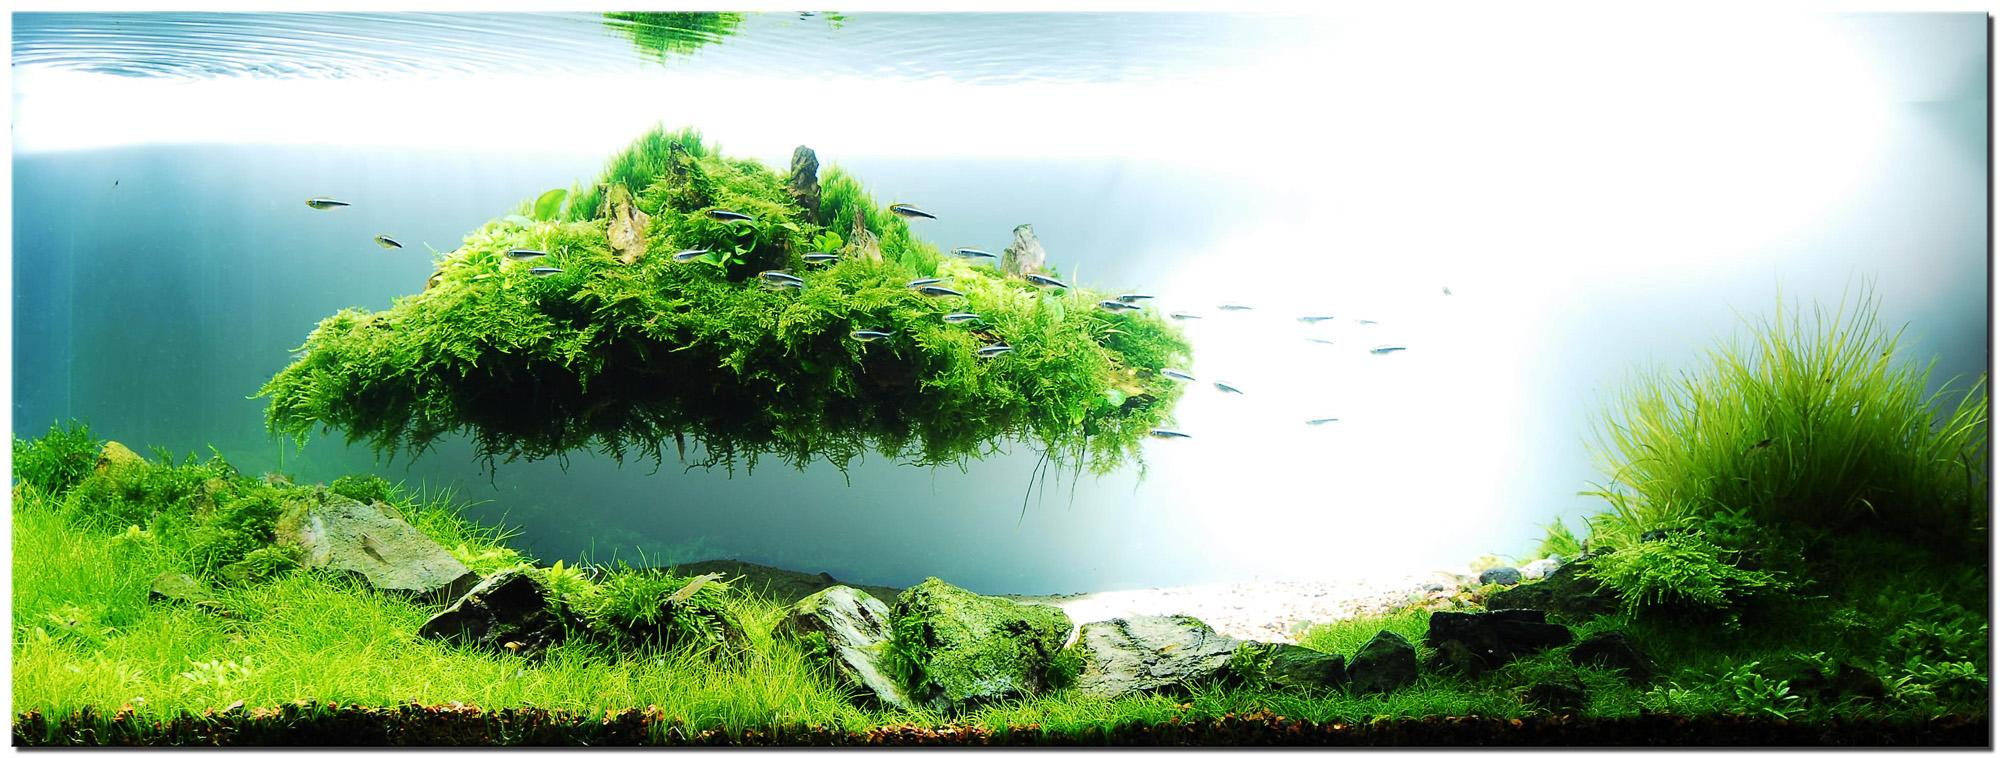 1_plantedtank_islandscape2